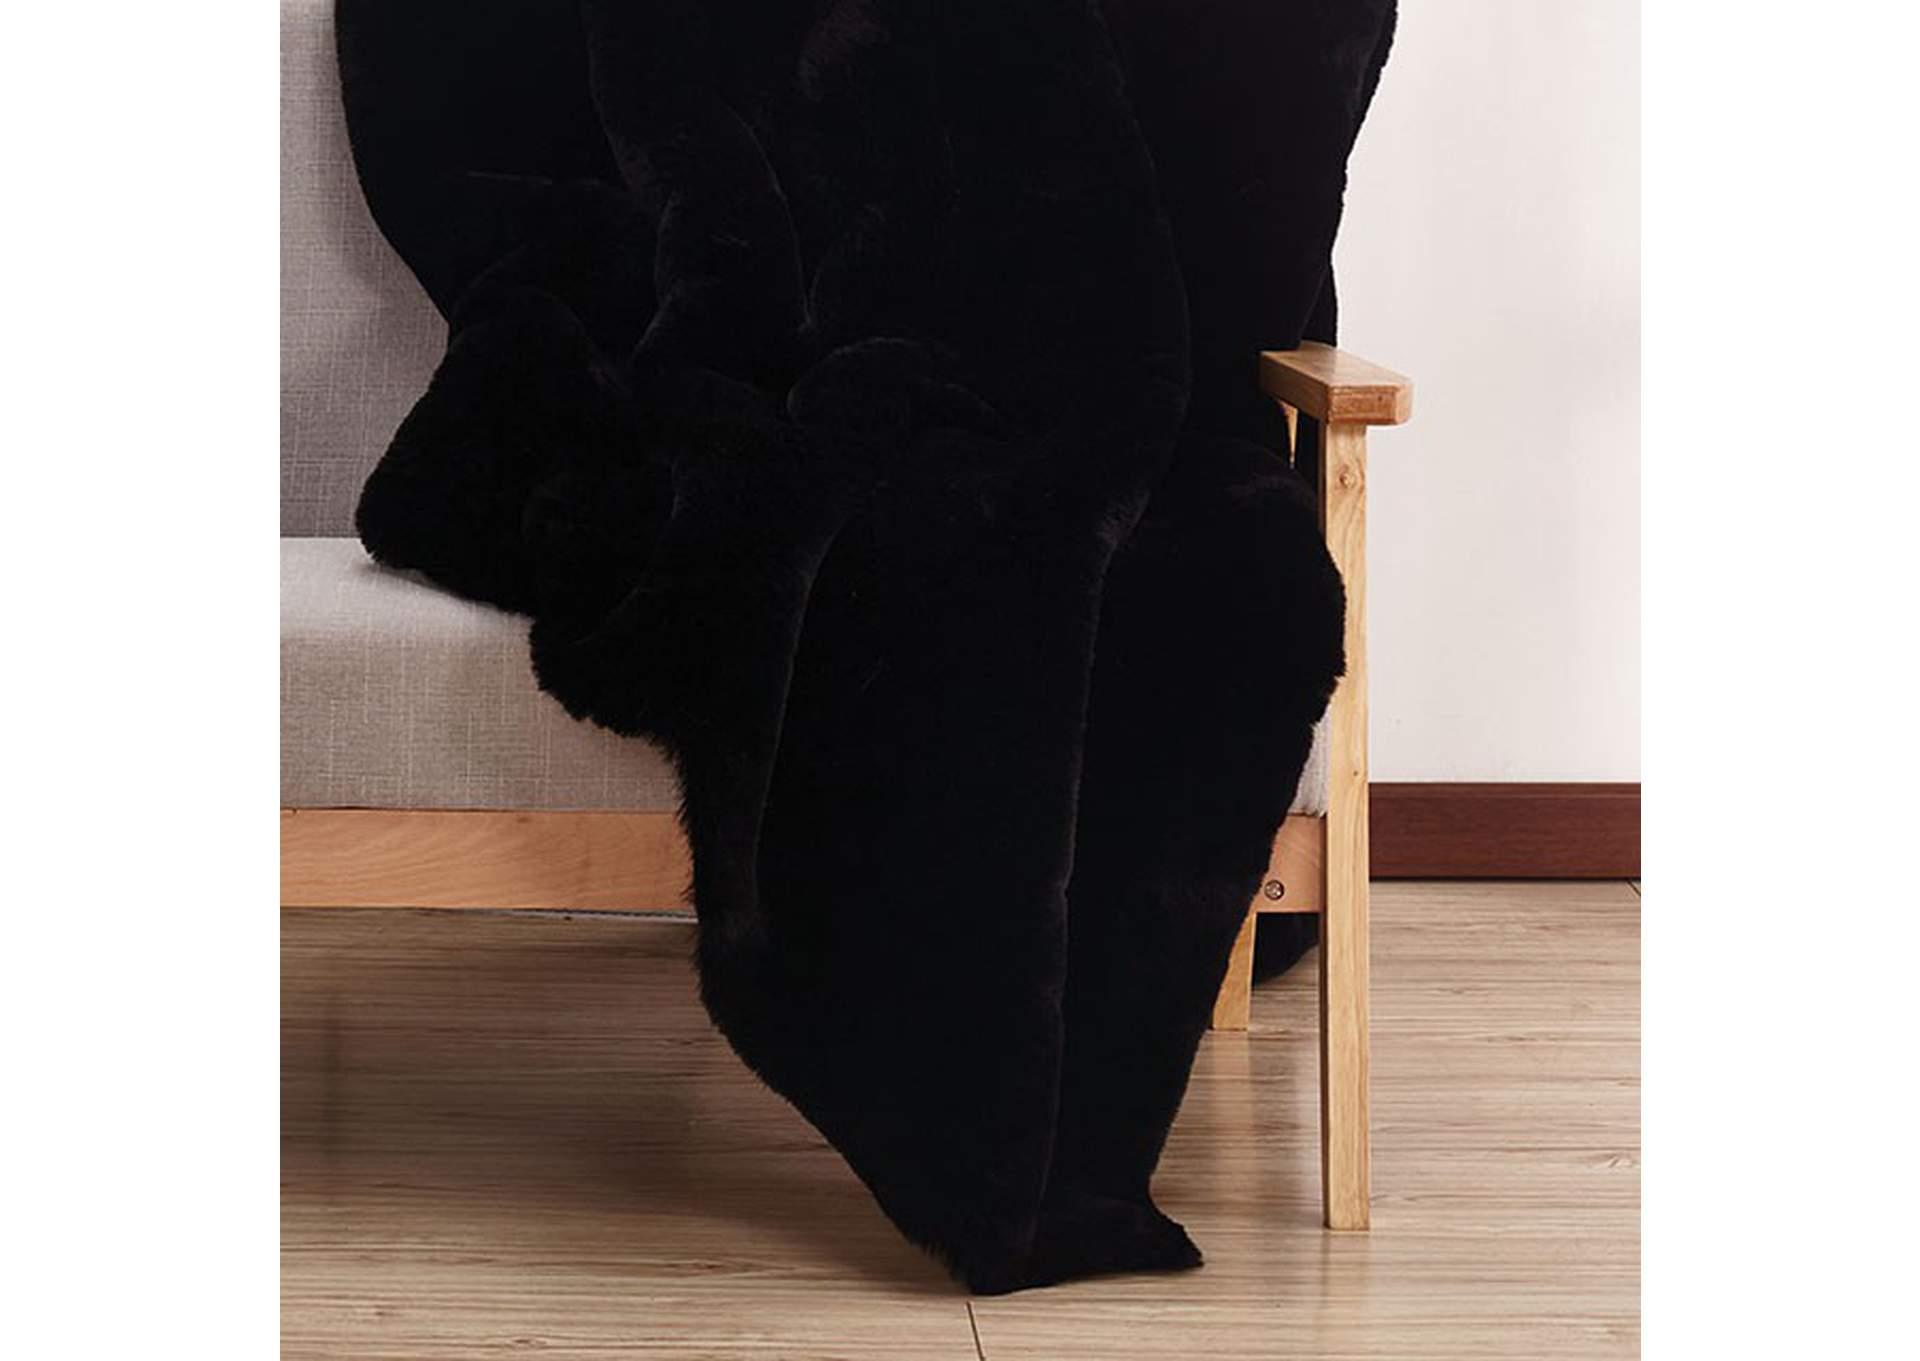 Quality Rugs Home Furnishings Federal Way Wa Caparica